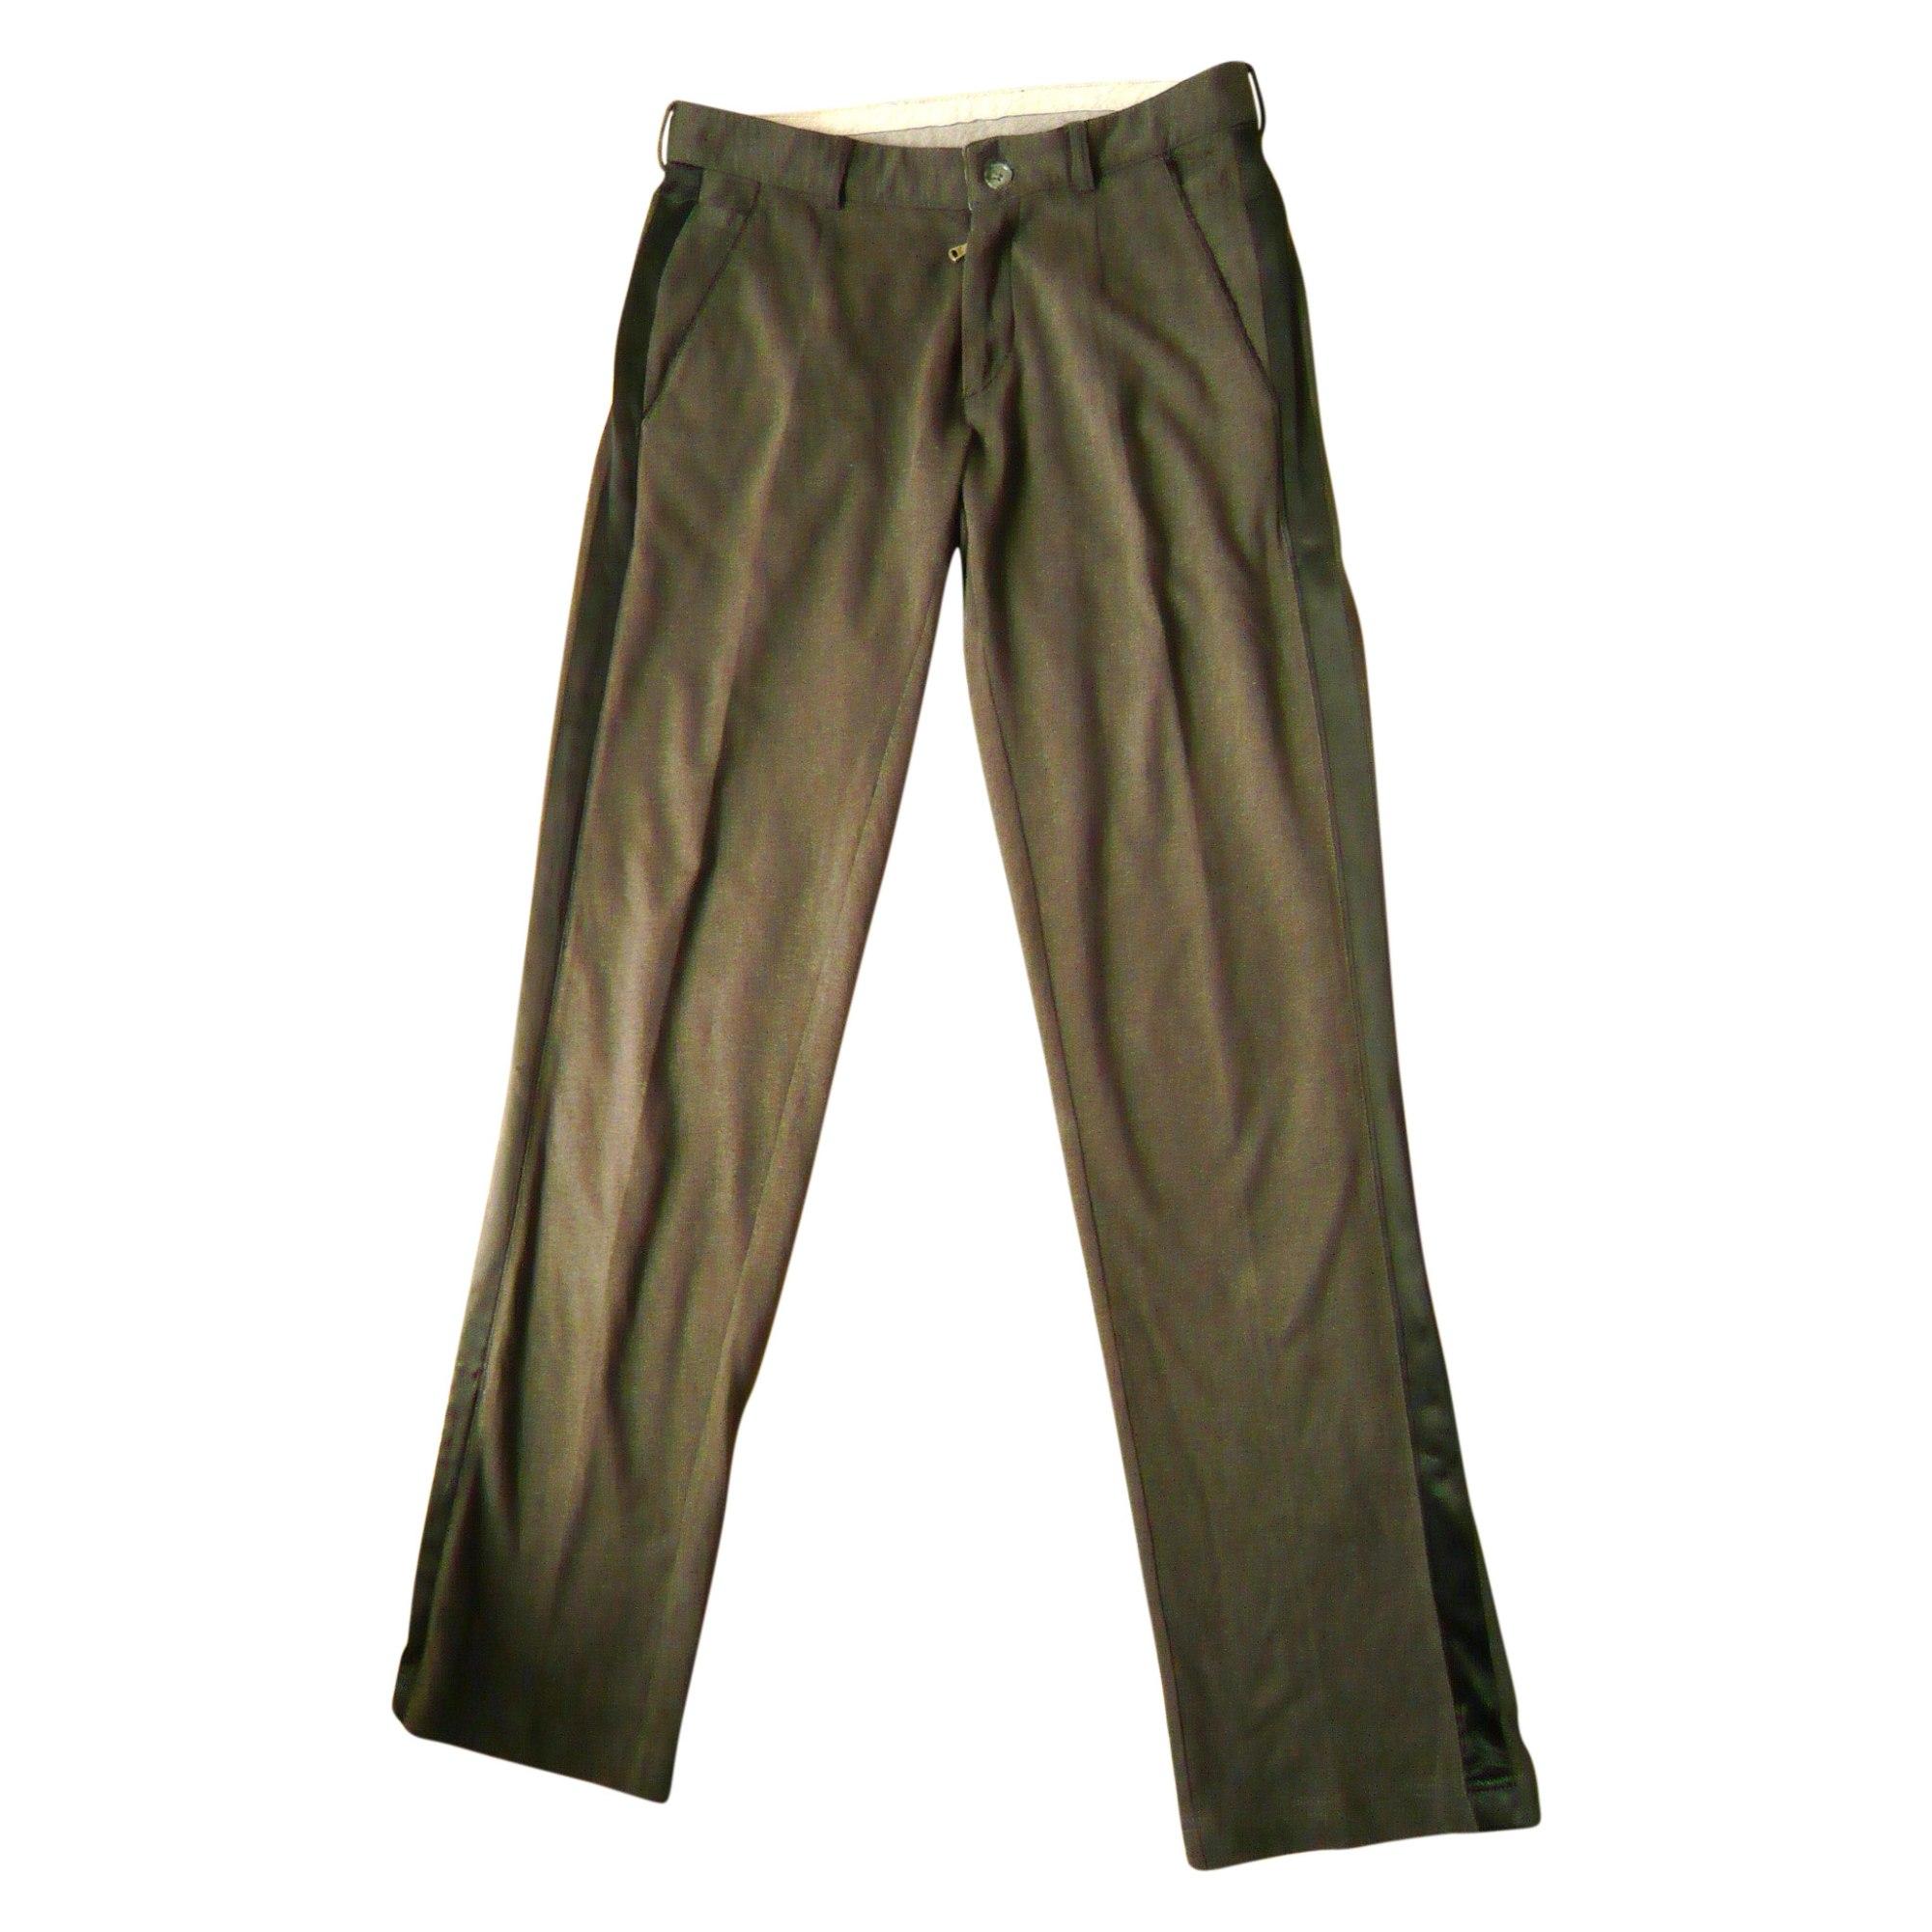 7ab461fd8008c4 Pantalon large DOLCE   GABBANA 40 (M) gris - 1787334